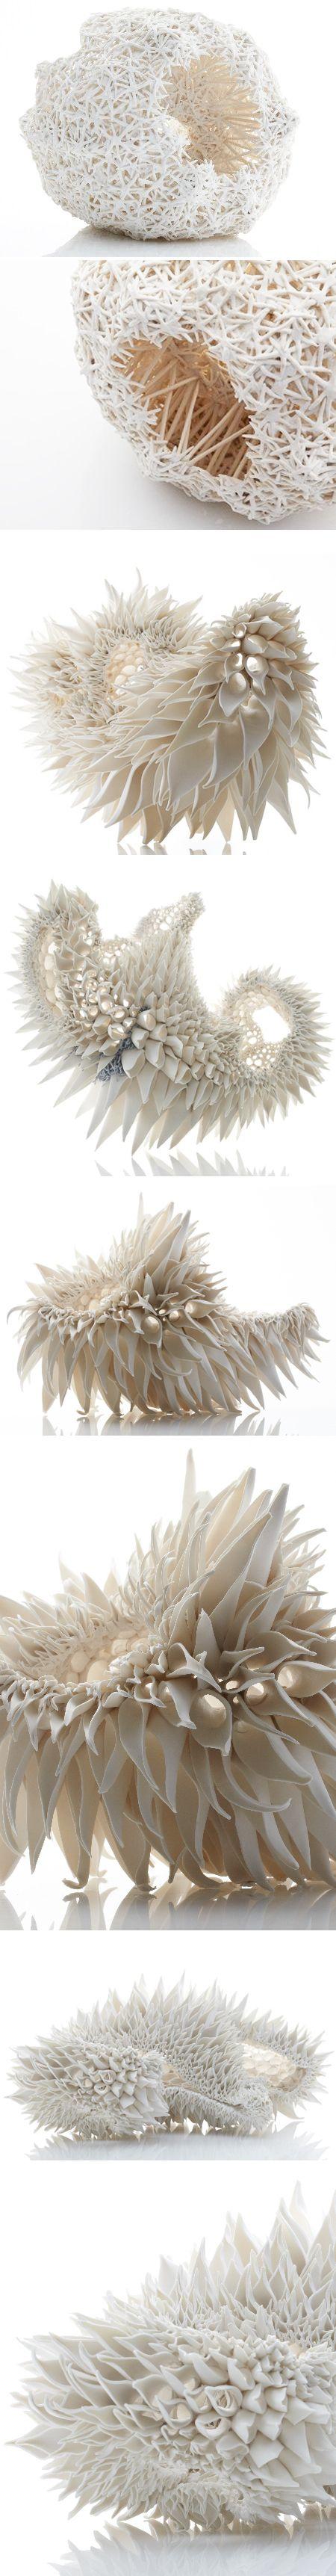 nuala o'donovan:: organic ceramic